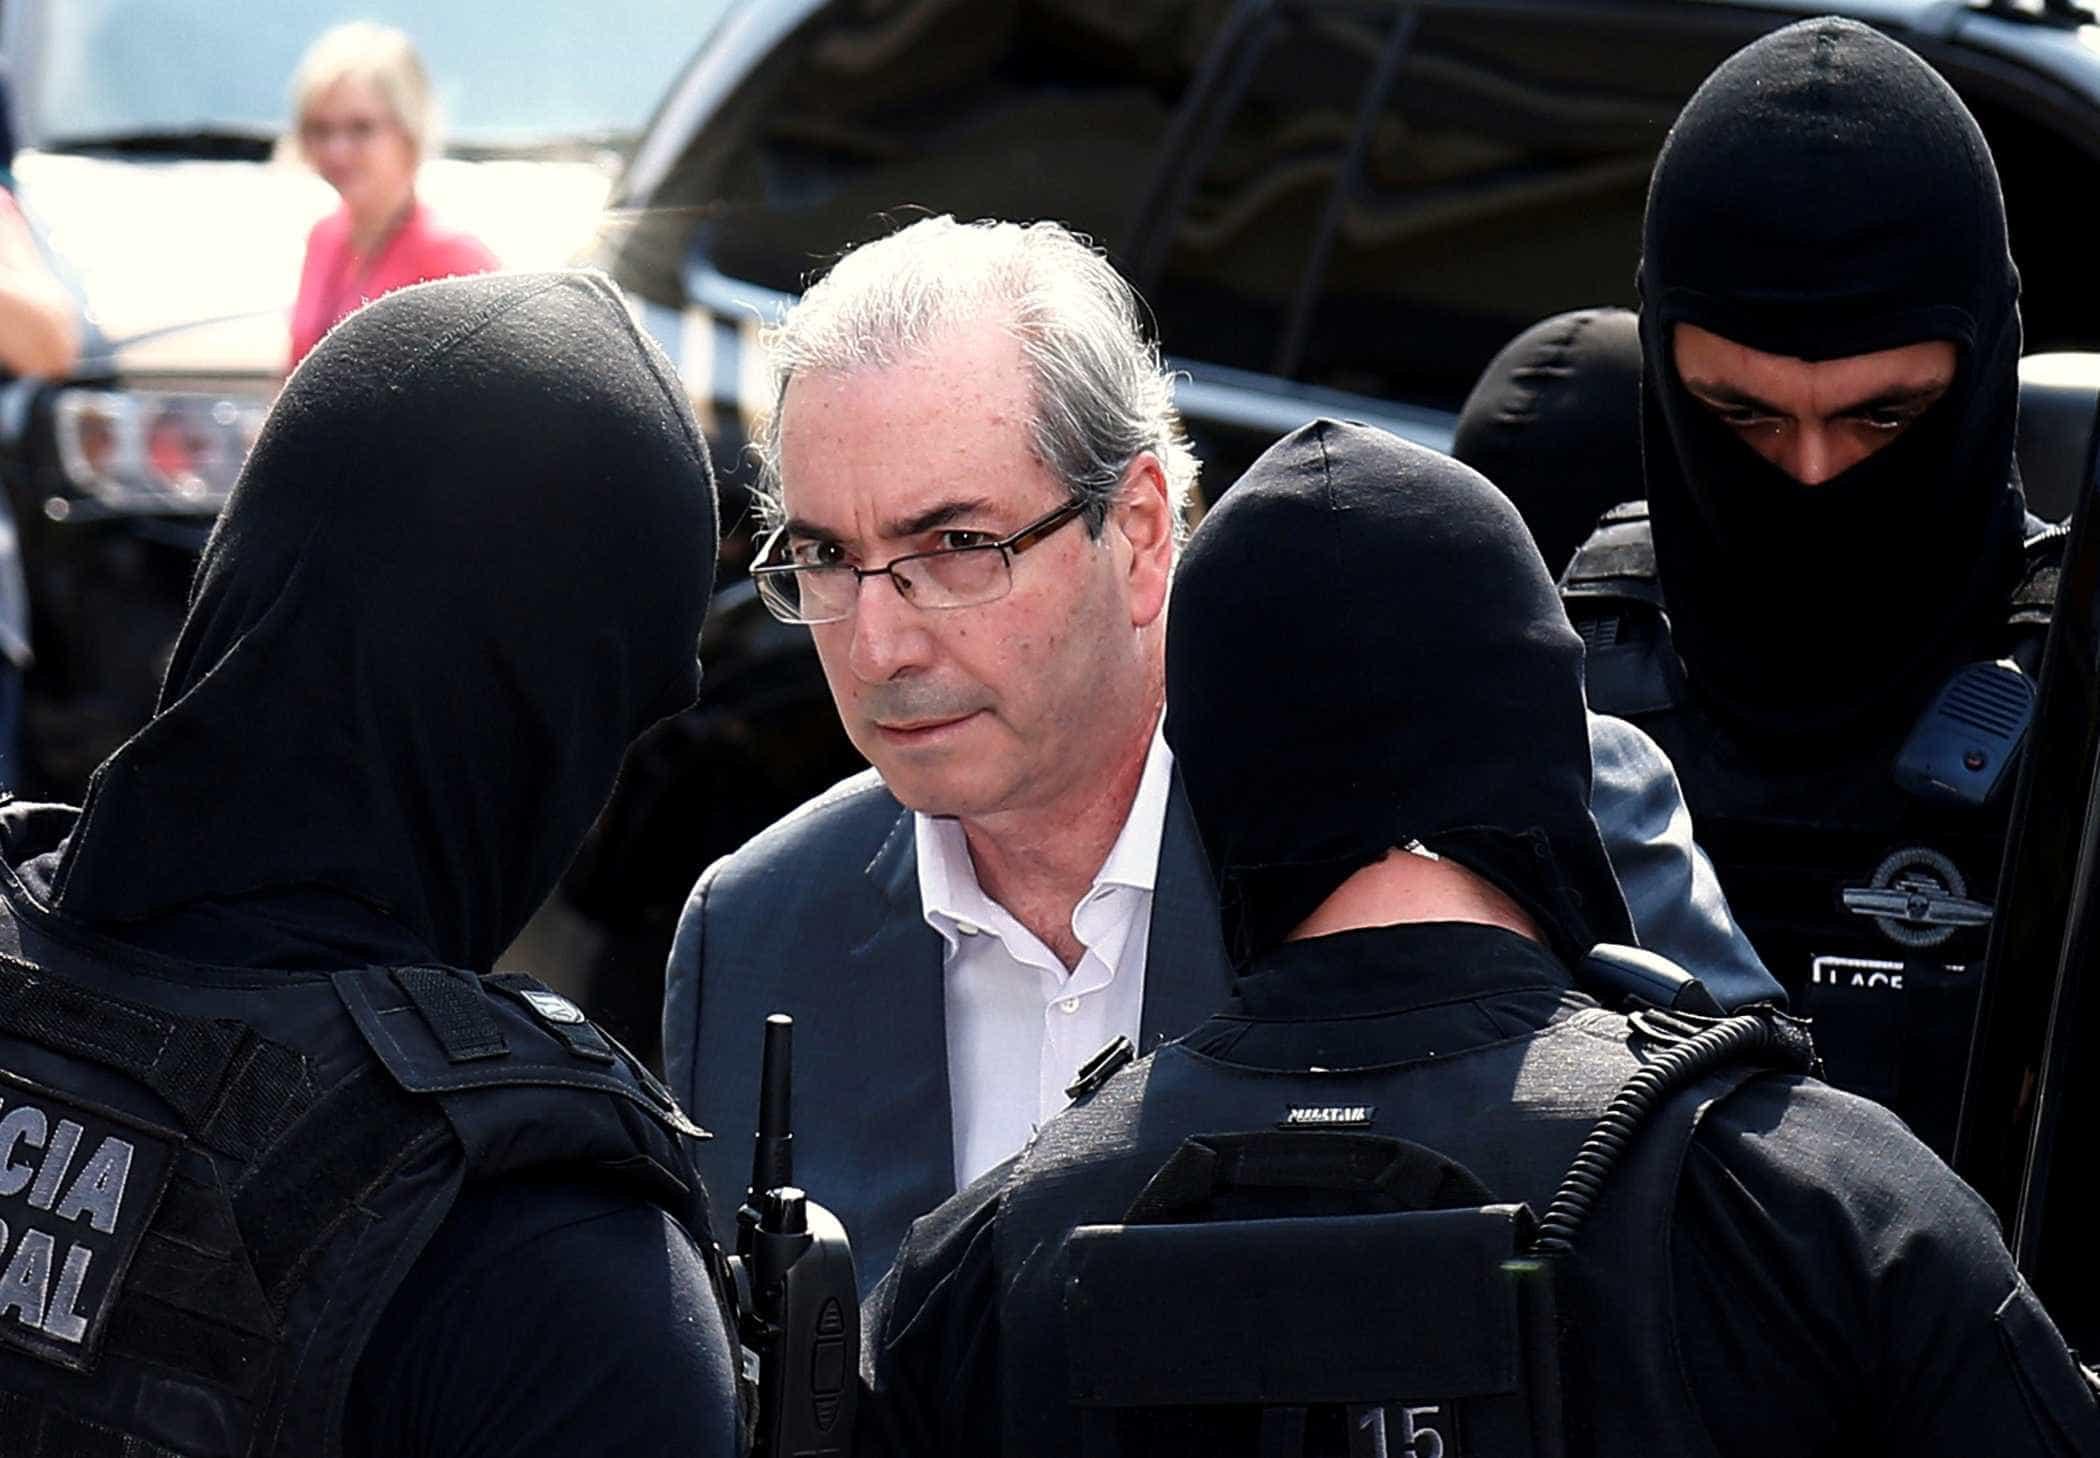 Processos sobre Lula, Geddel, Cunha e Henrique Alves mudam de juízes